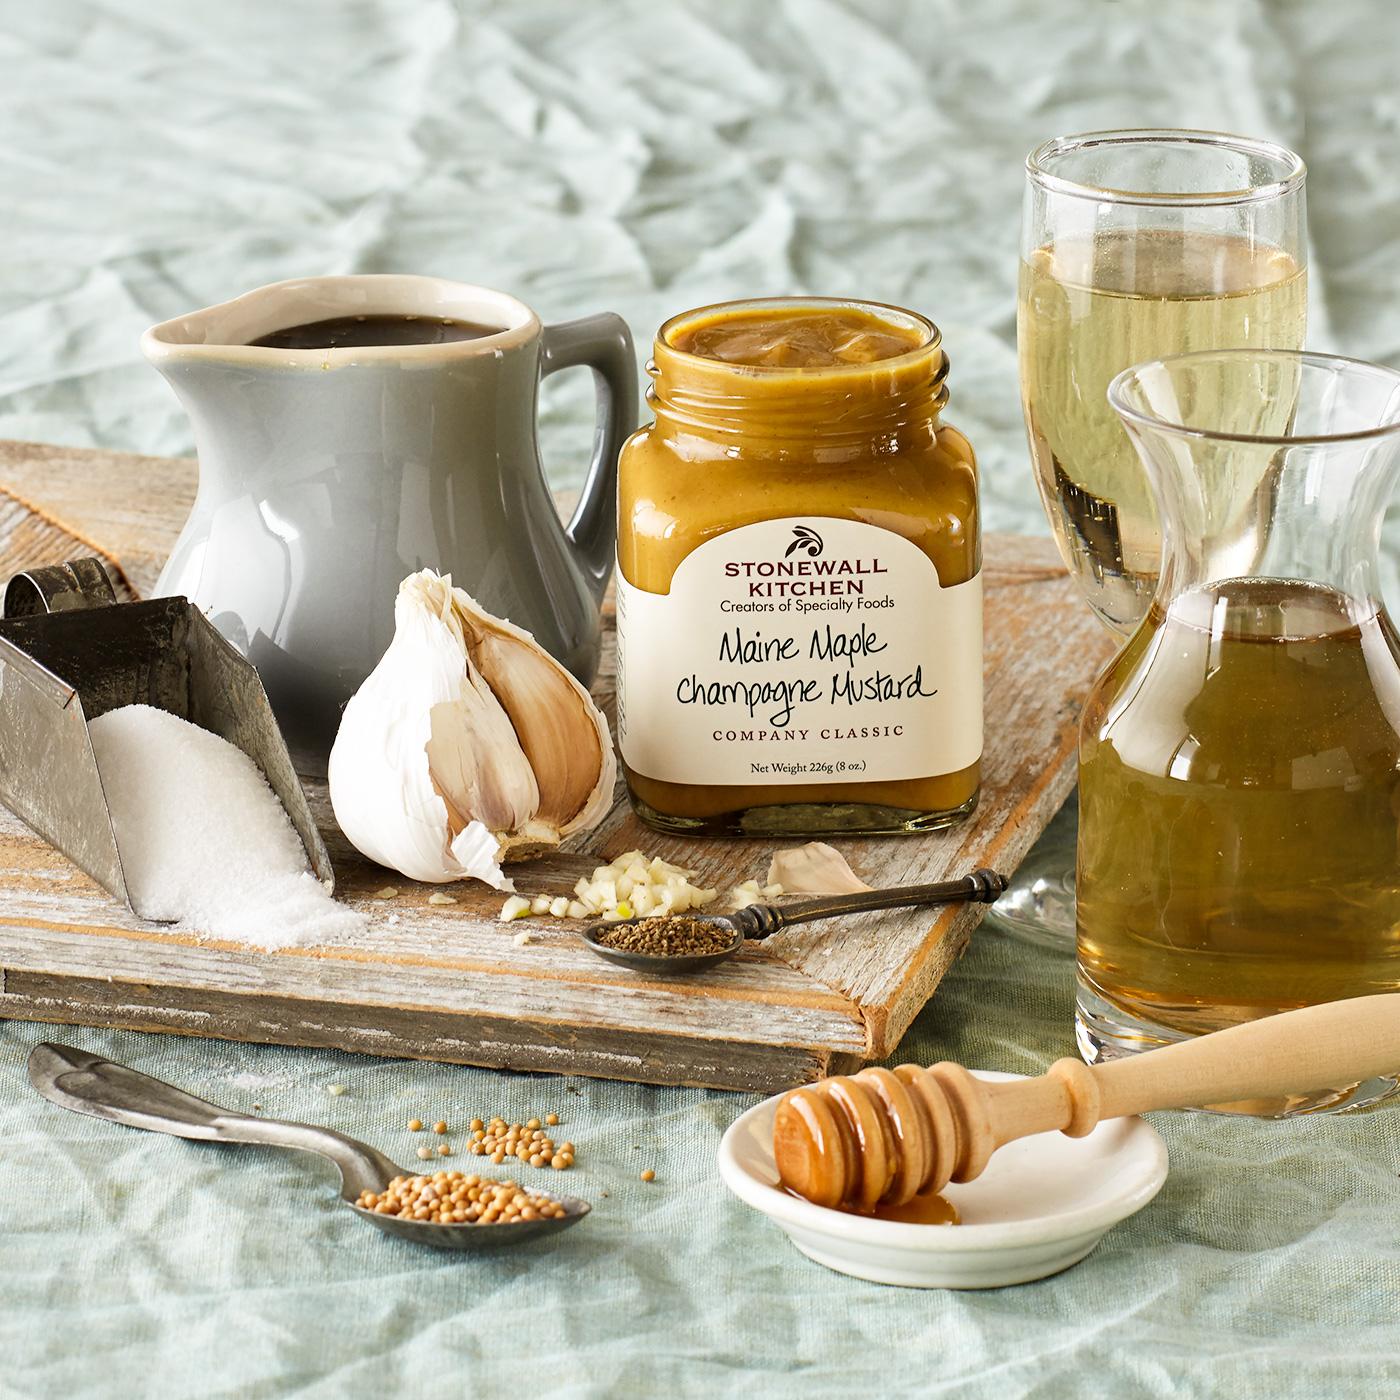 maine maple champagne mustard condiments stonewall kitchen. Black Bedroom Furniture Sets. Home Design Ideas